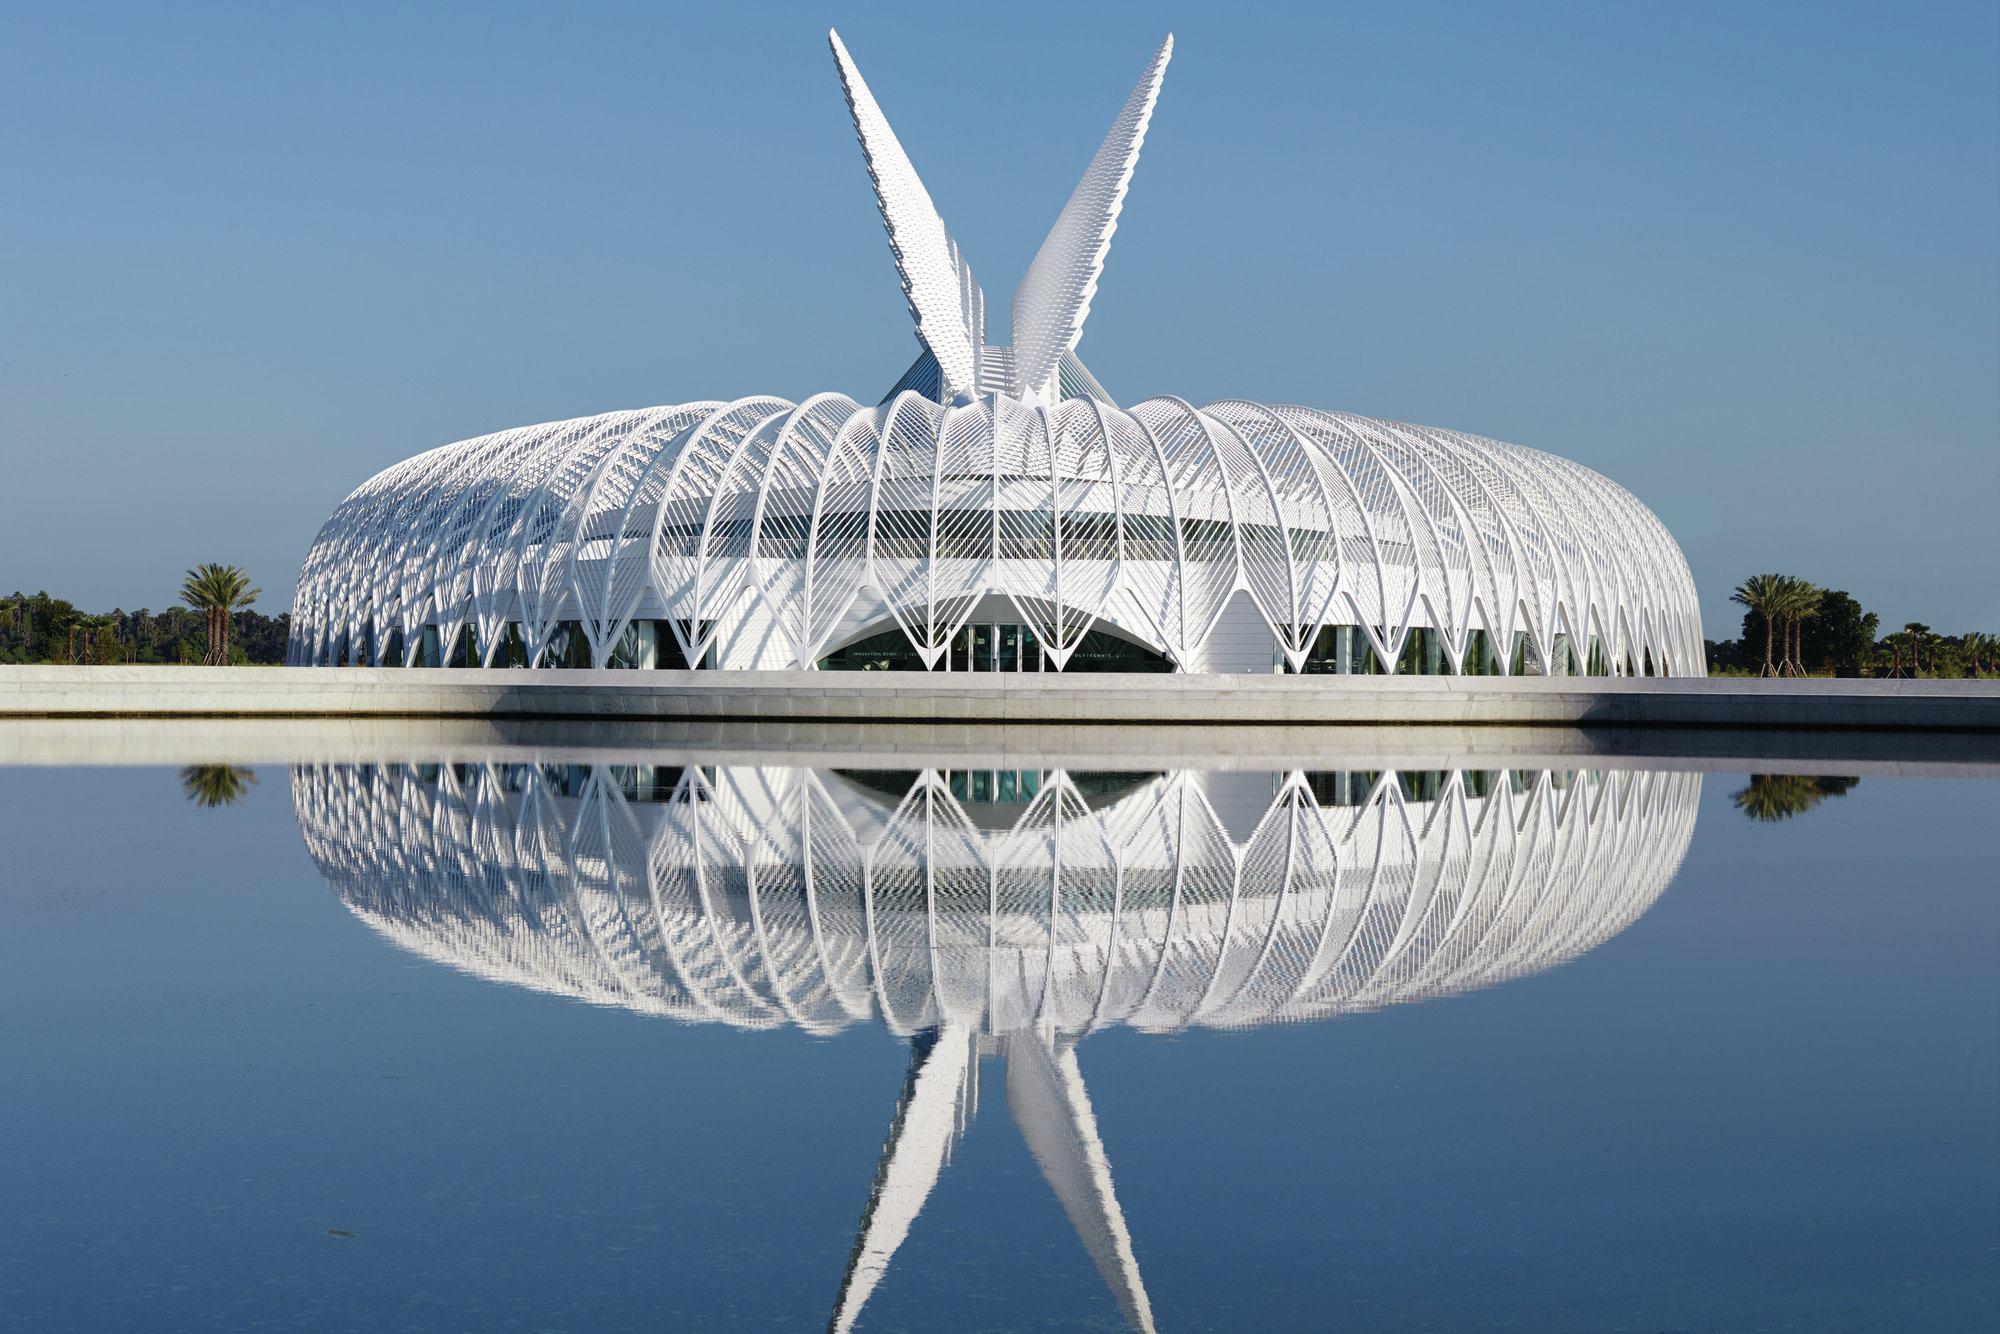 Modern Architecture Orlando florida polytechnic university, designedsantiago calatrava